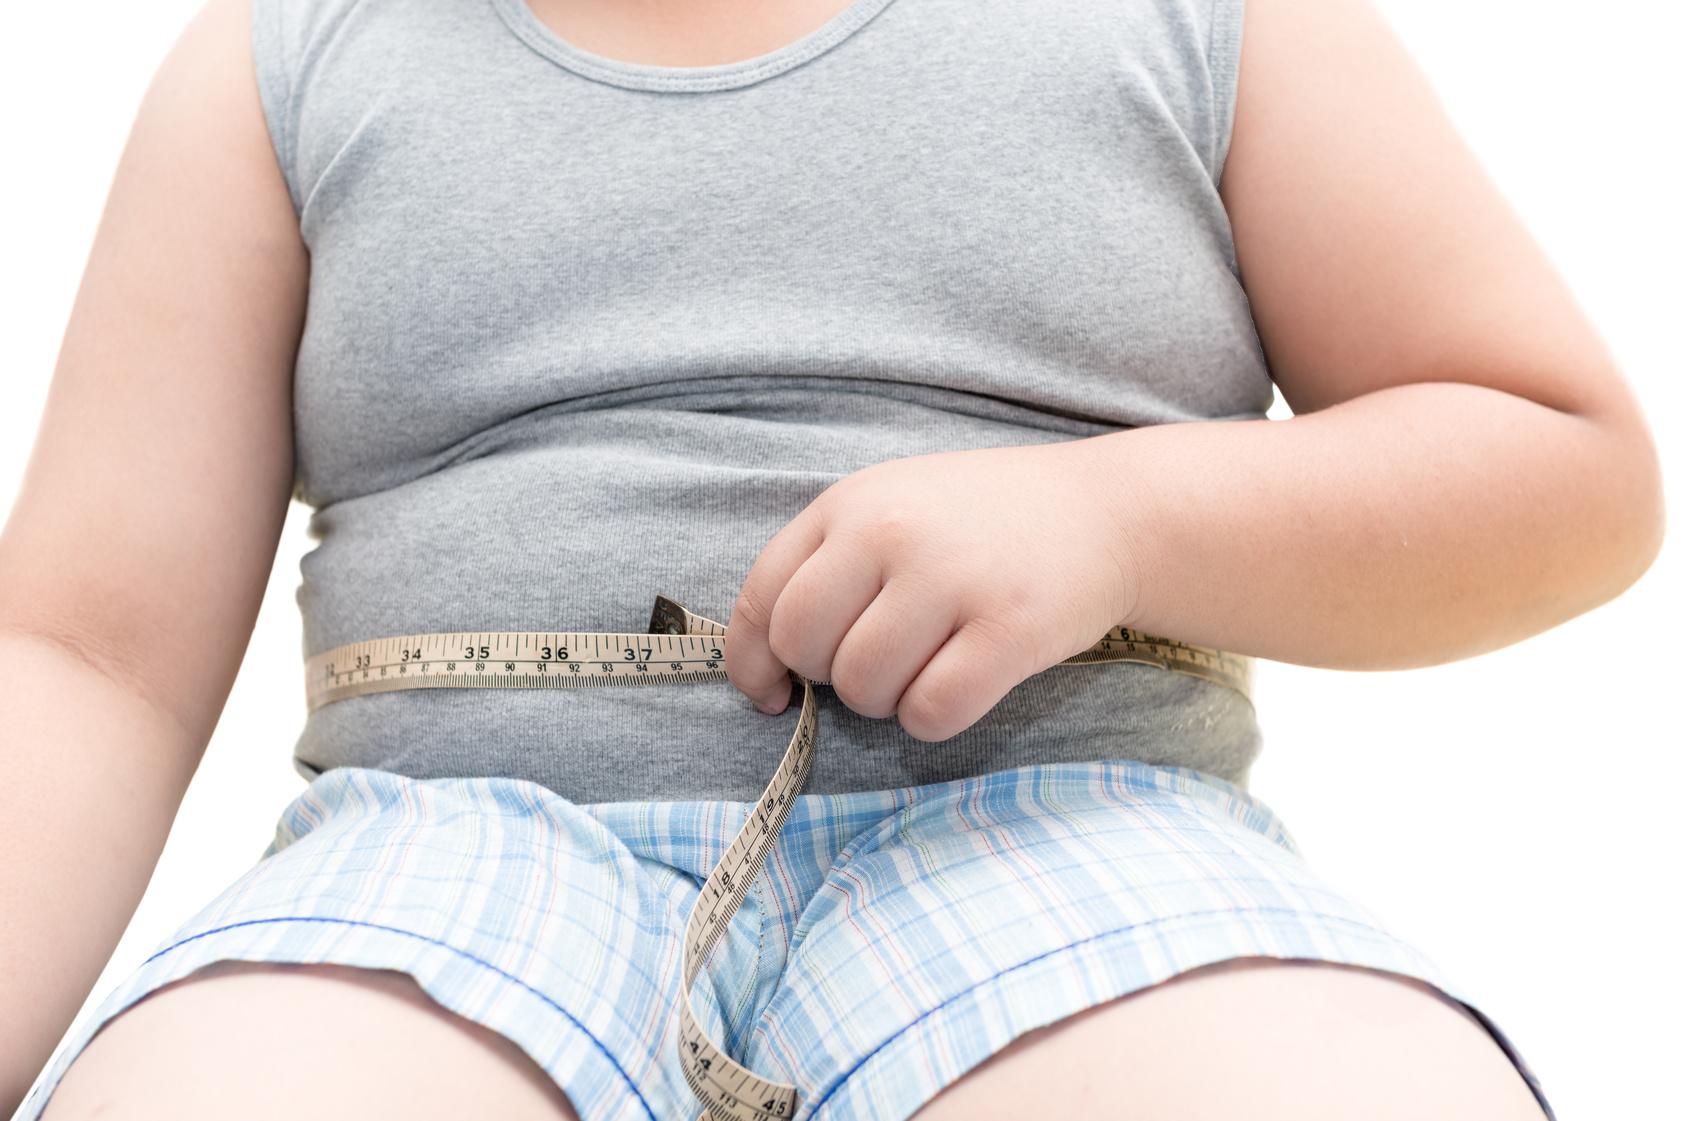 Yogurt, bambino sovrappeso metro